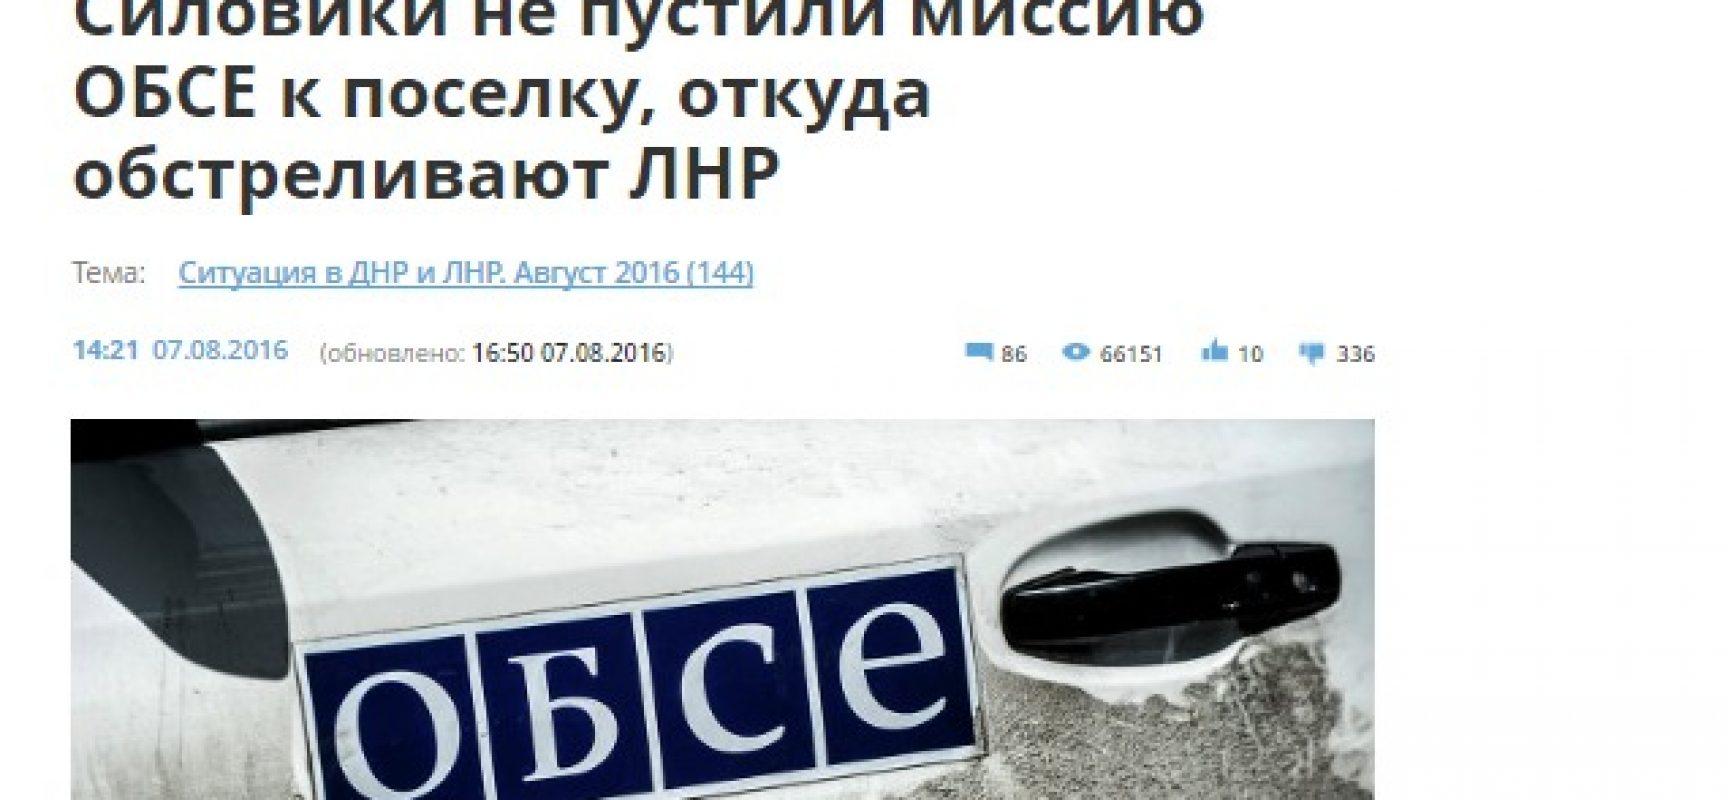 Fake : Militari Ucraini impedisco ad osservatori OSCE di accedere